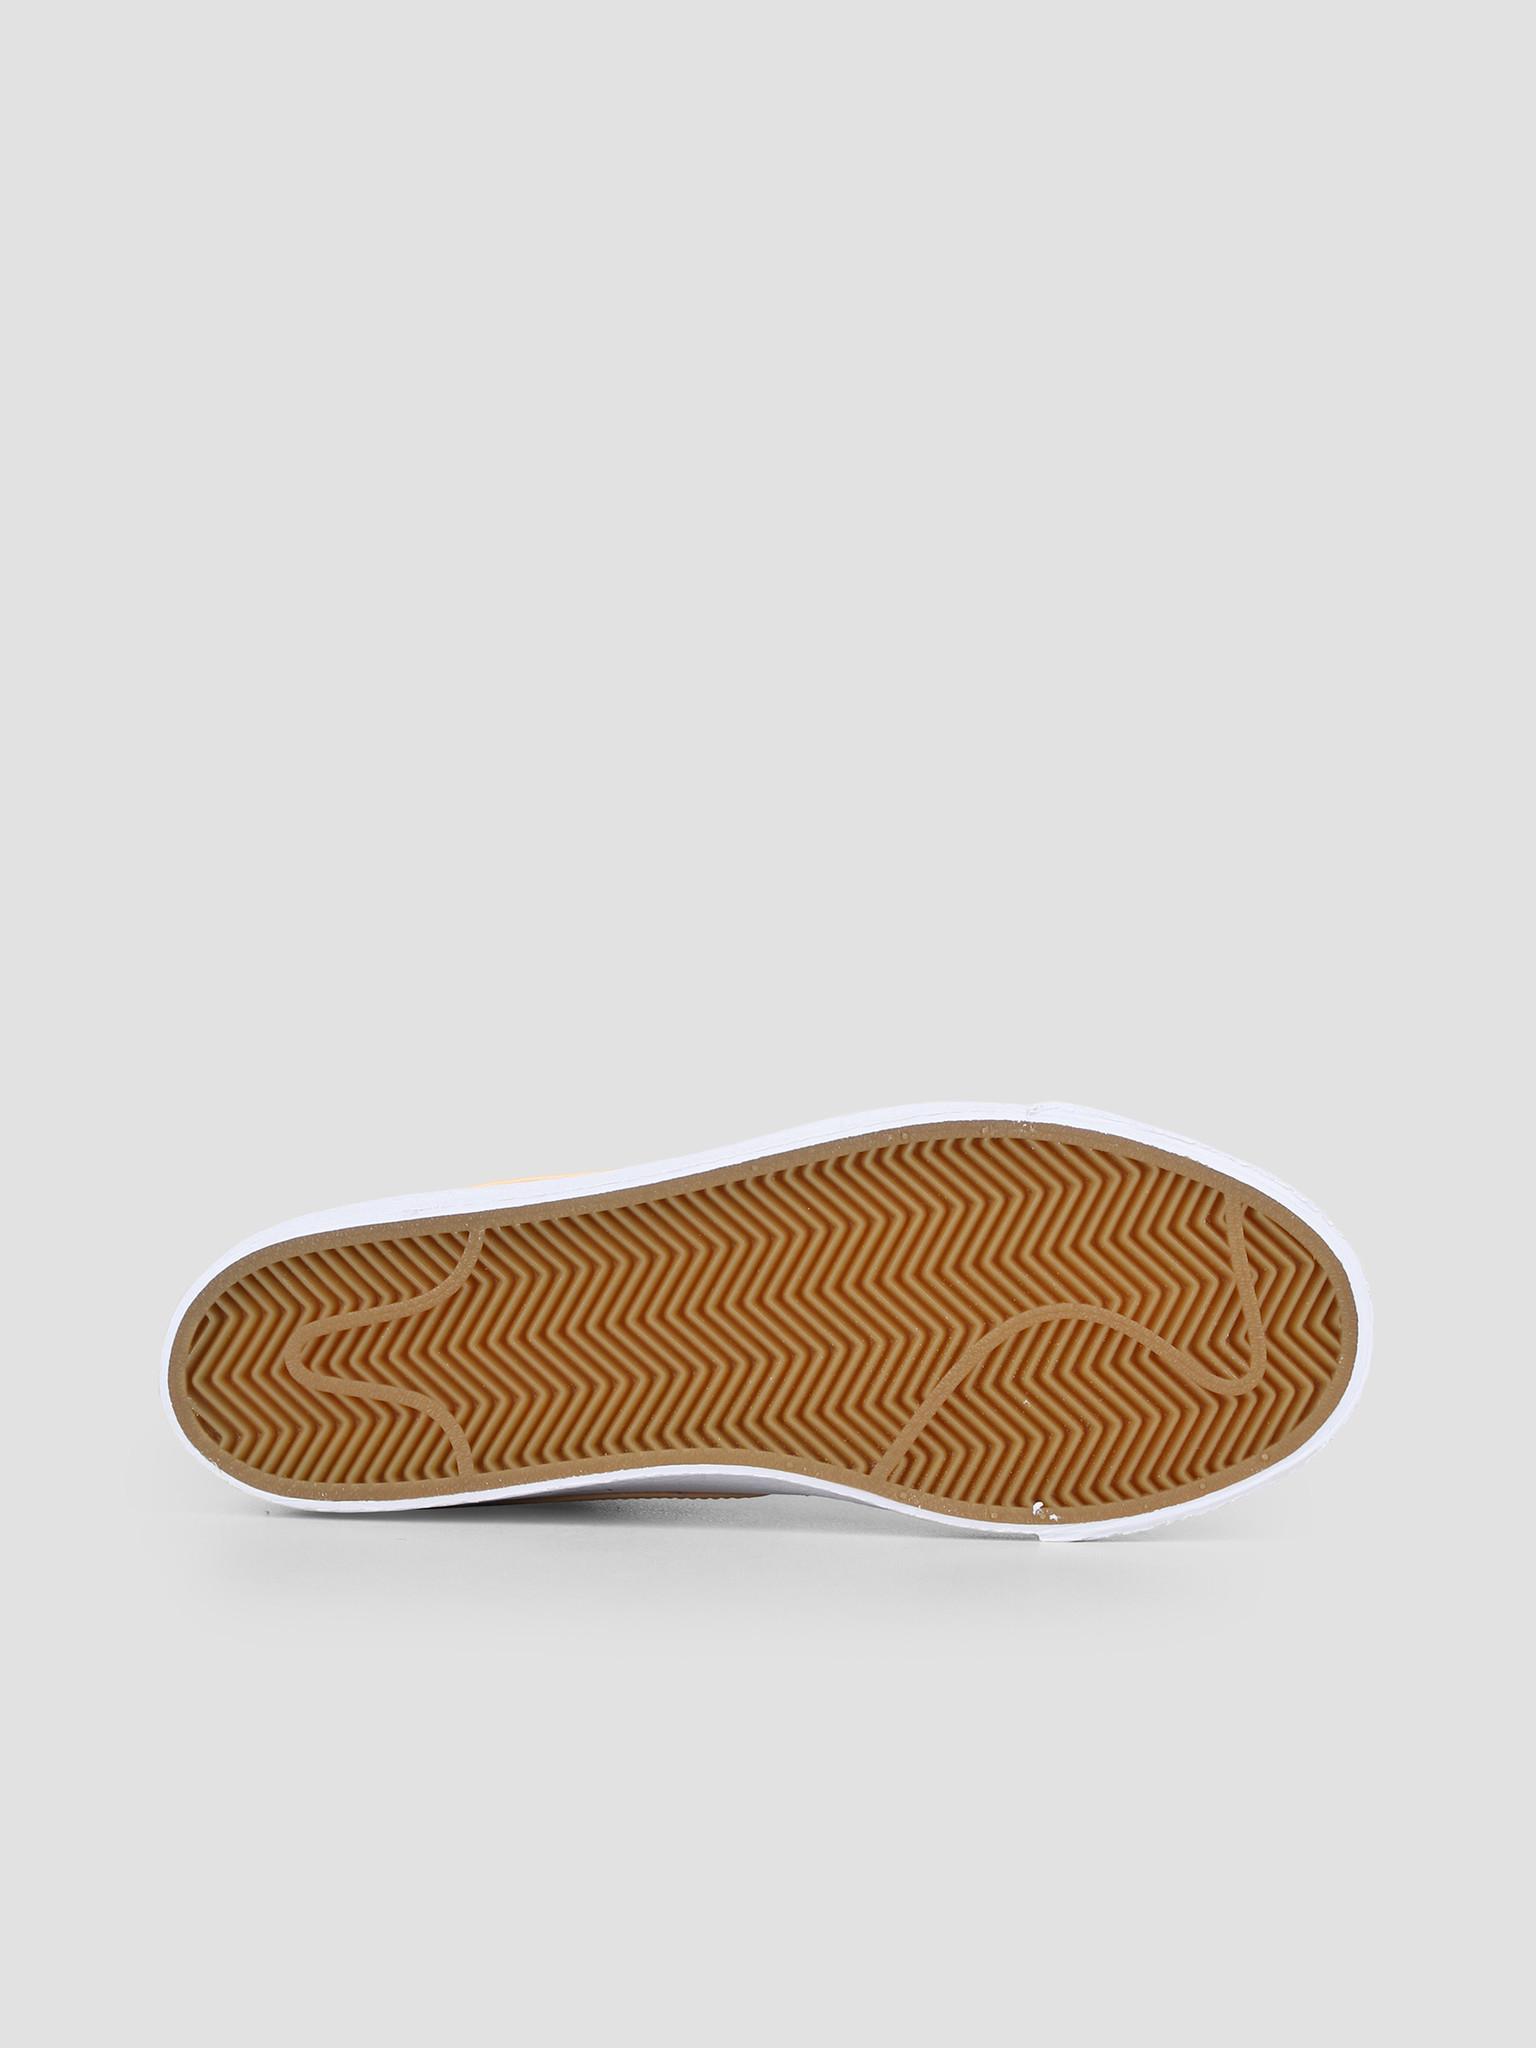 Nike Nike SB Zoom Blazer Mid Prm White Celestial Gold CJ6983-102